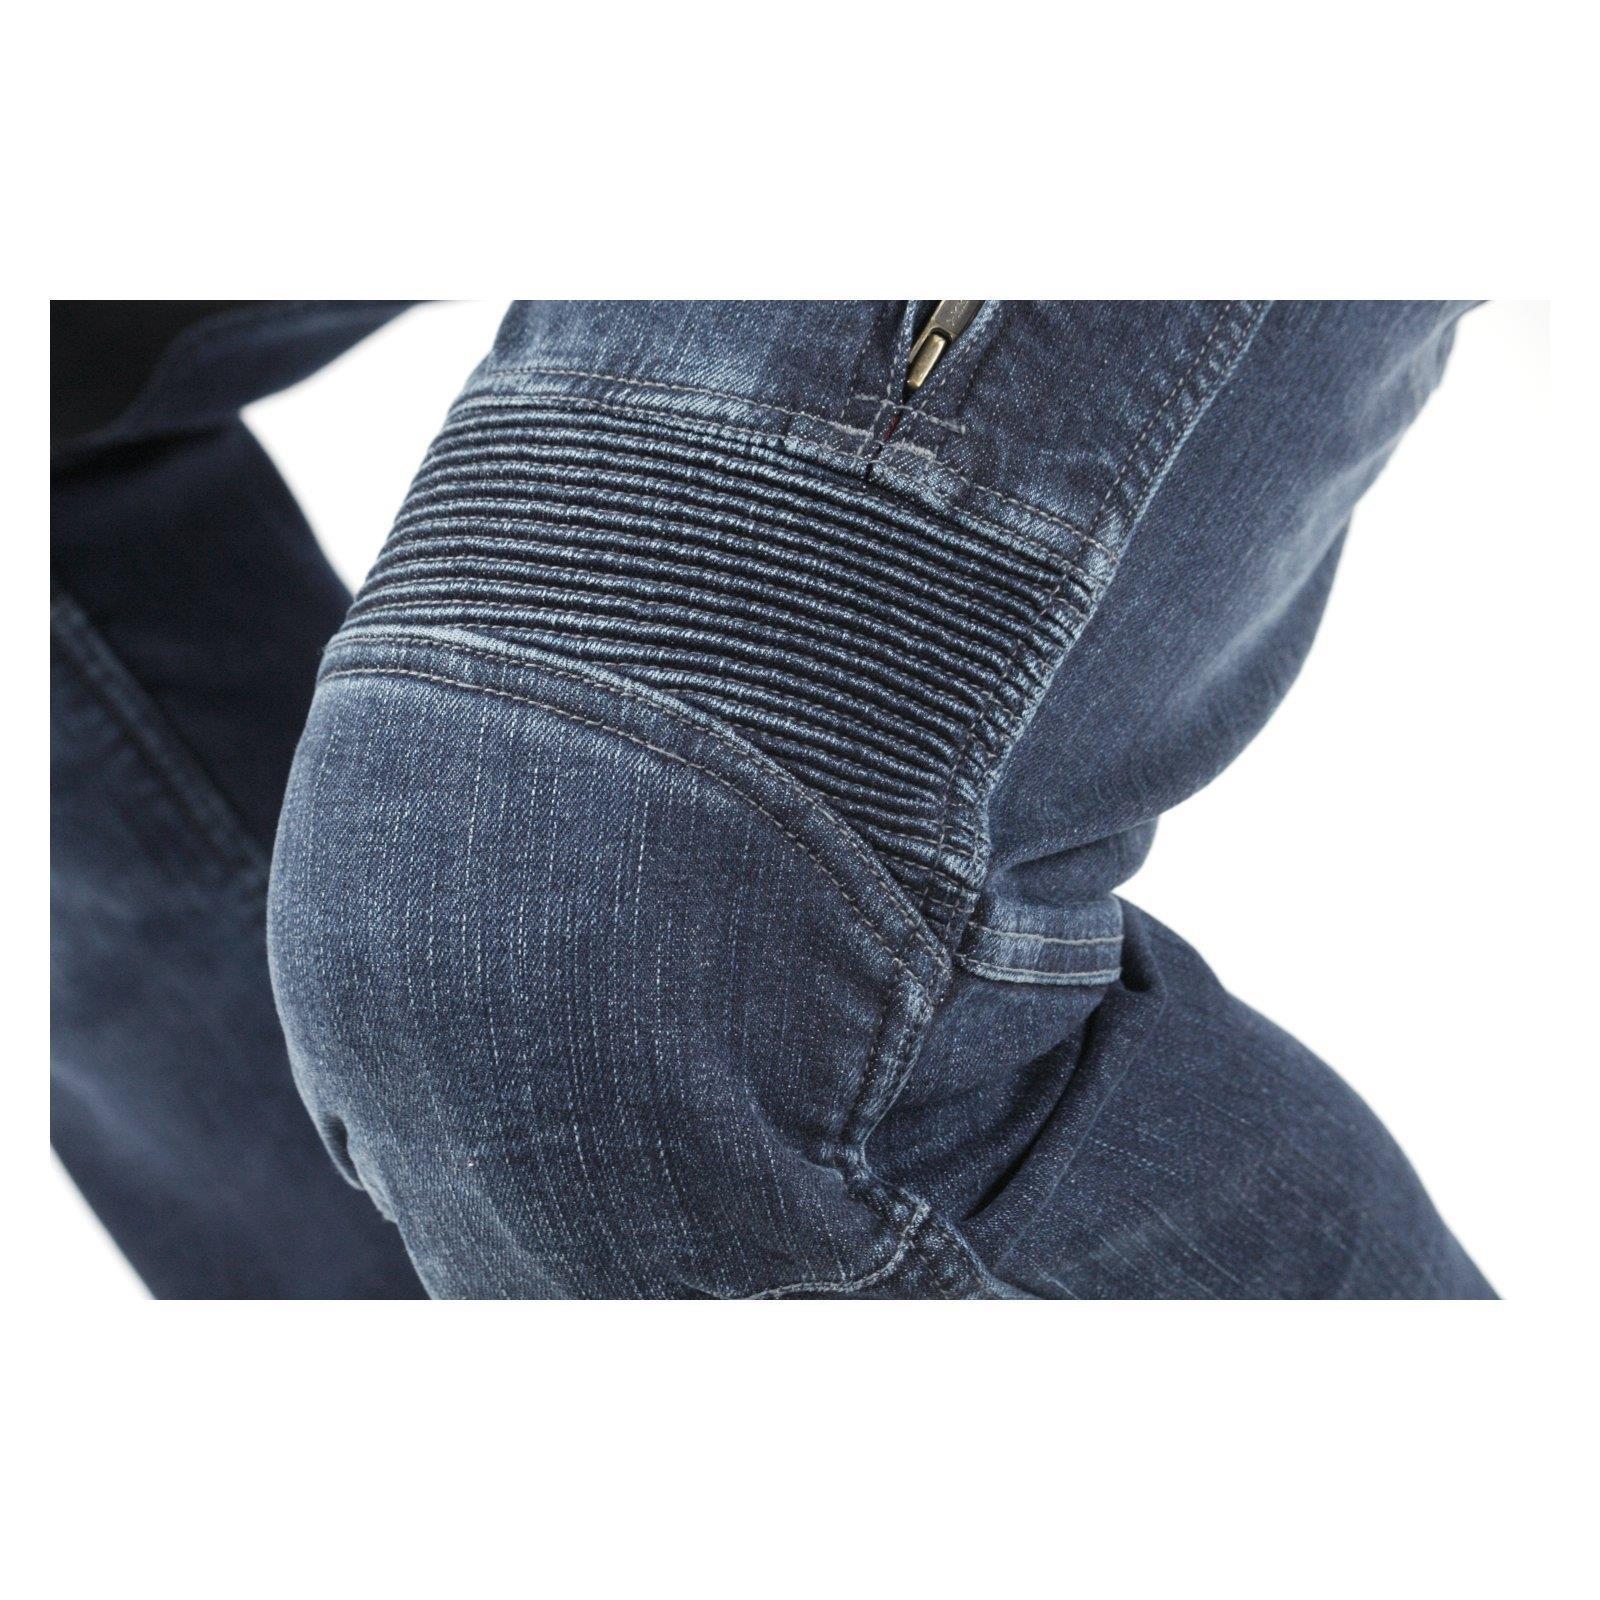 Trilobite-Pantaloni-Moto-Jeans-Abbigliamento-Parado-MICAS-URBAN-DUAL-PANTS-ACID miniatura 81